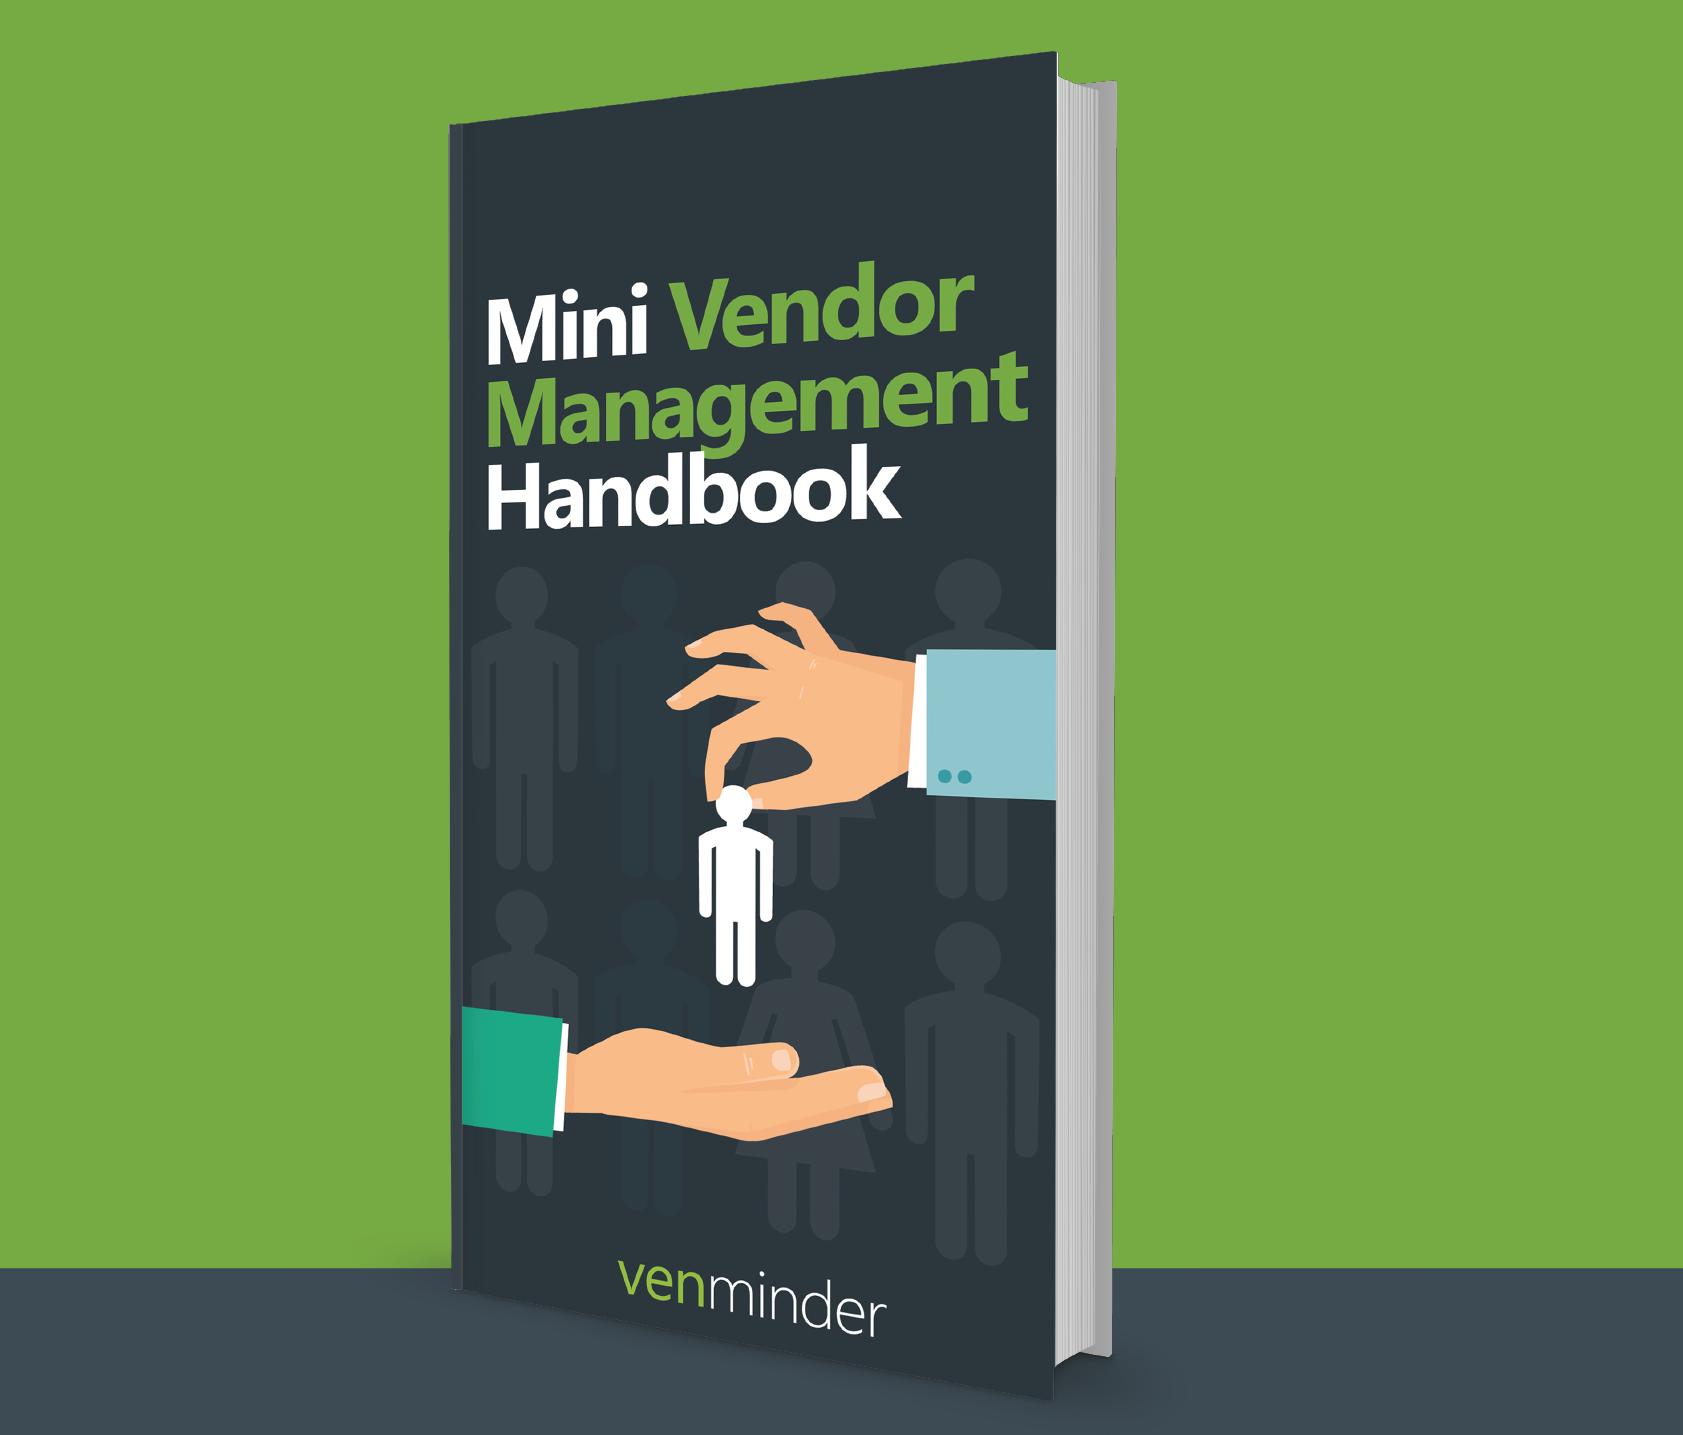 vendor management checklist and handbook